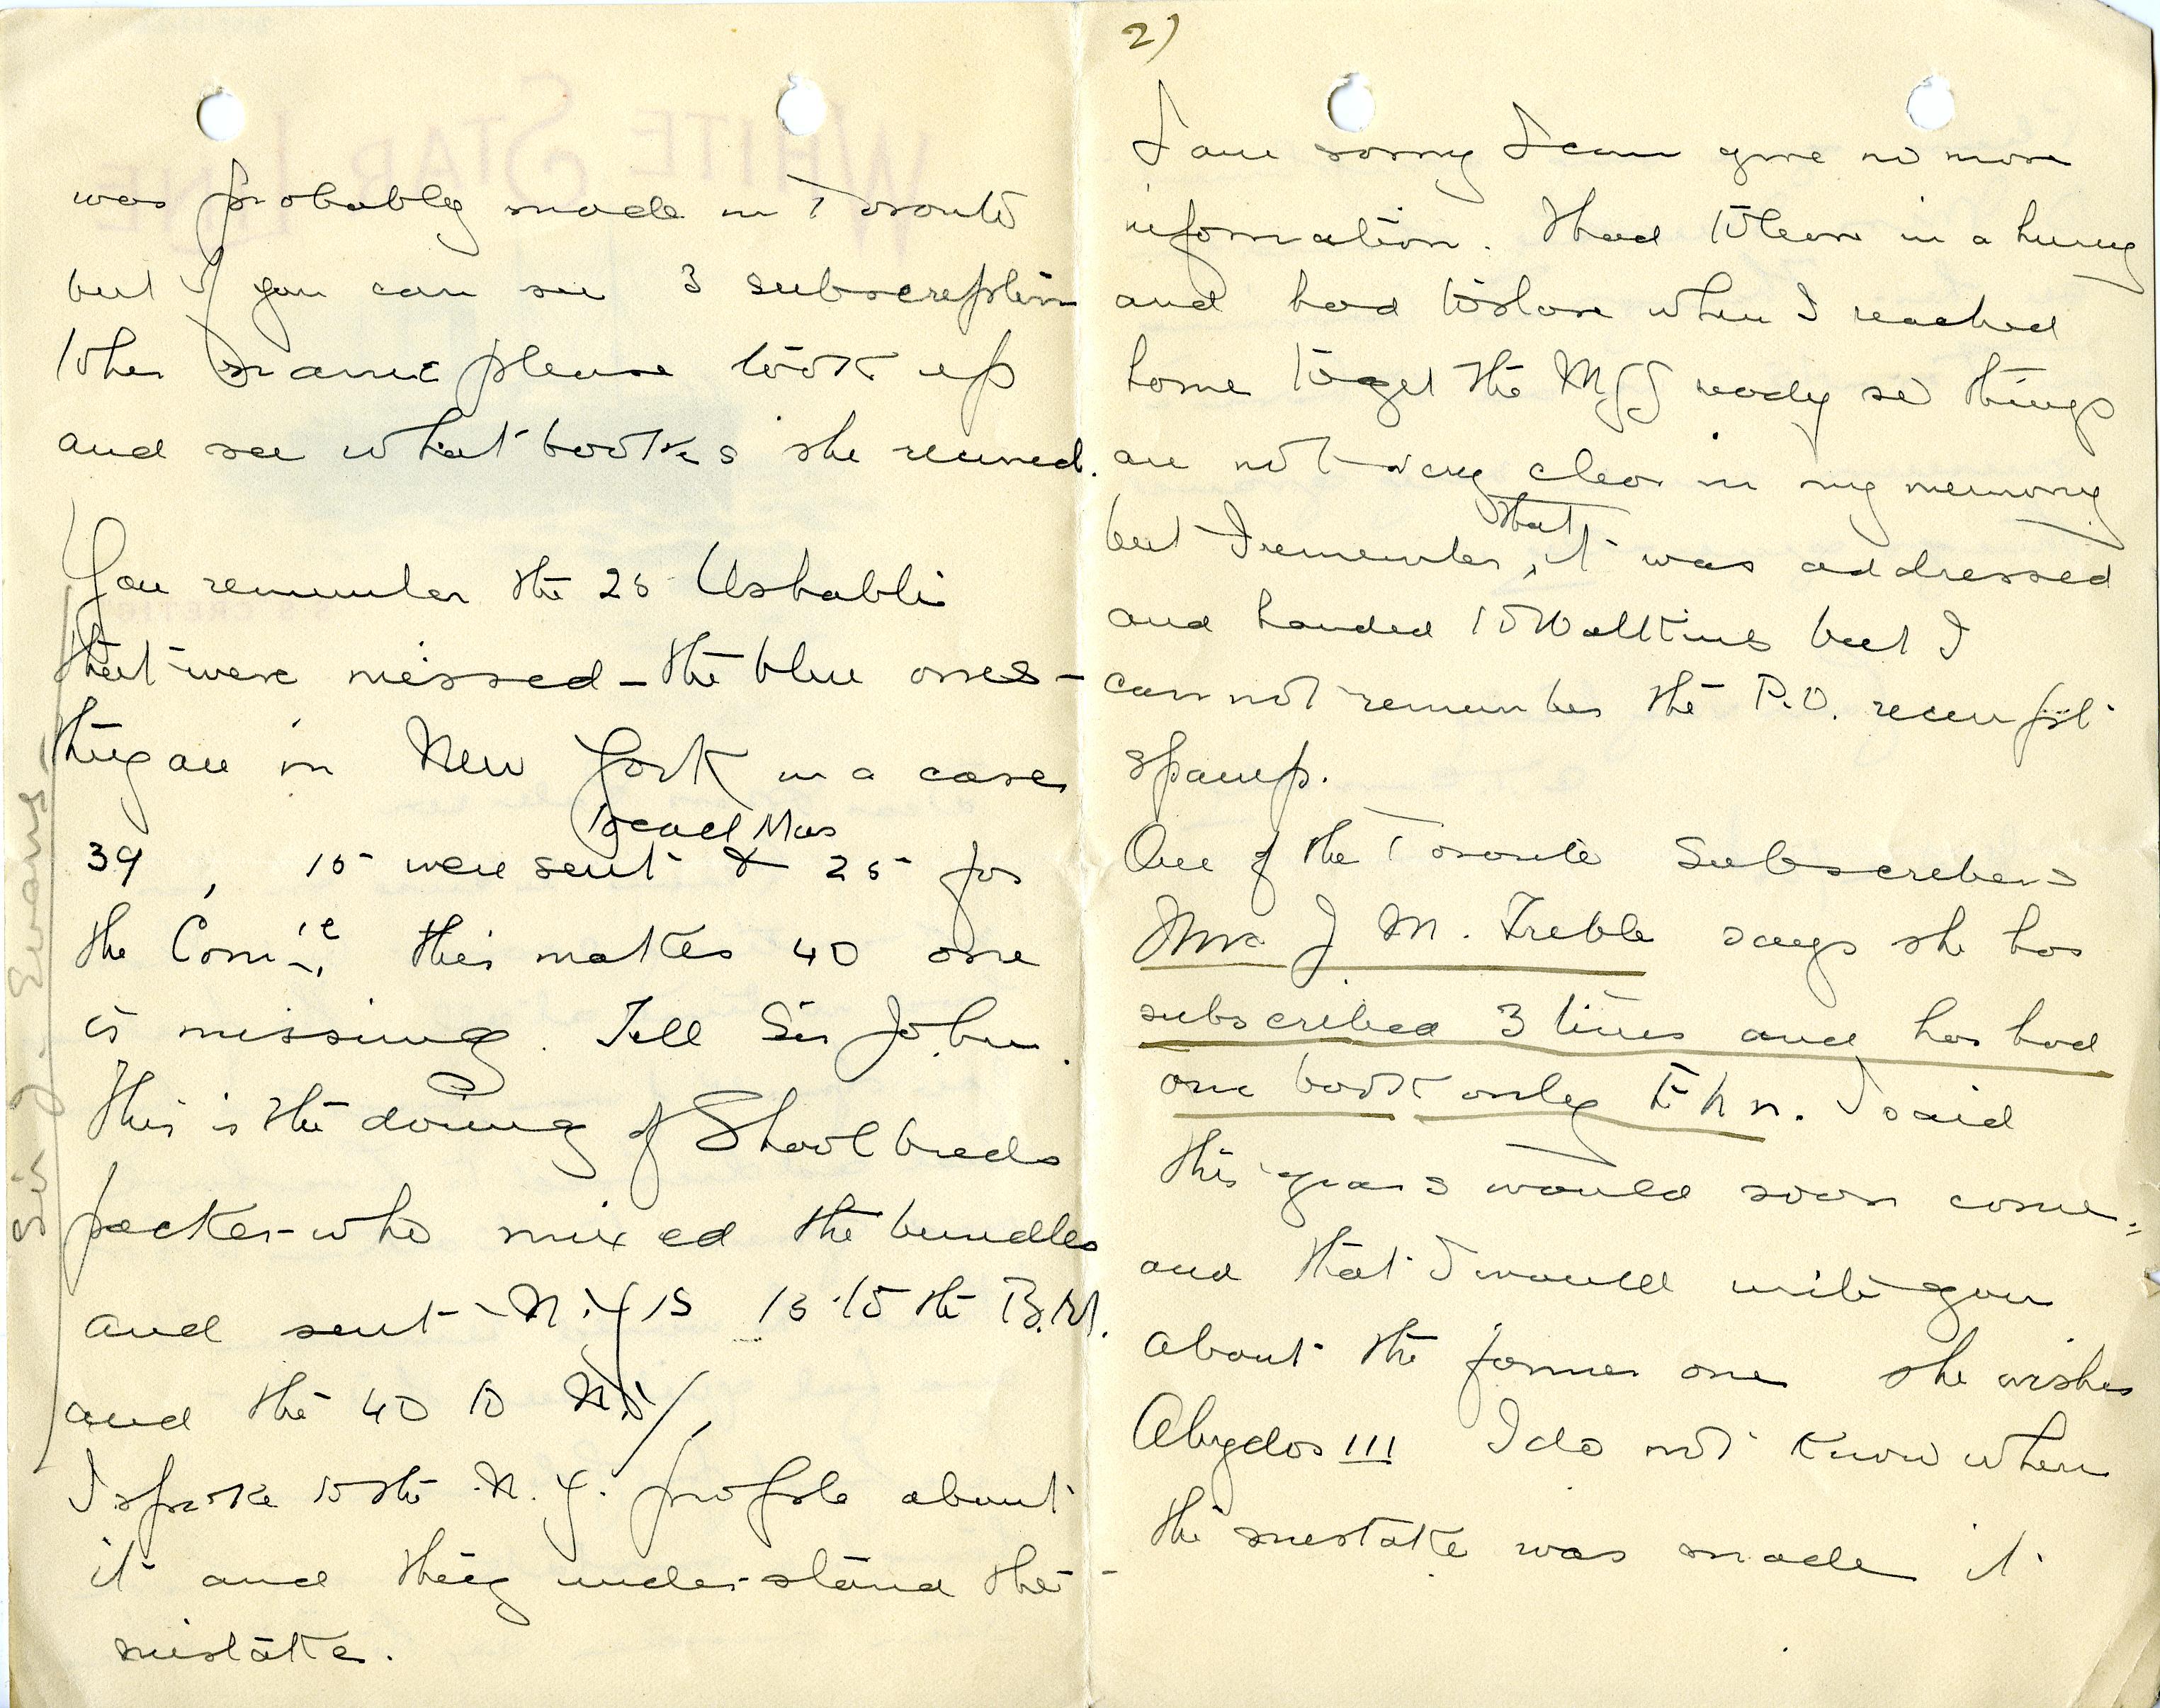 1904-05 Sinai, Deir el-Bahri, Oxyrhynchus, Naukratis DIST.23.26b